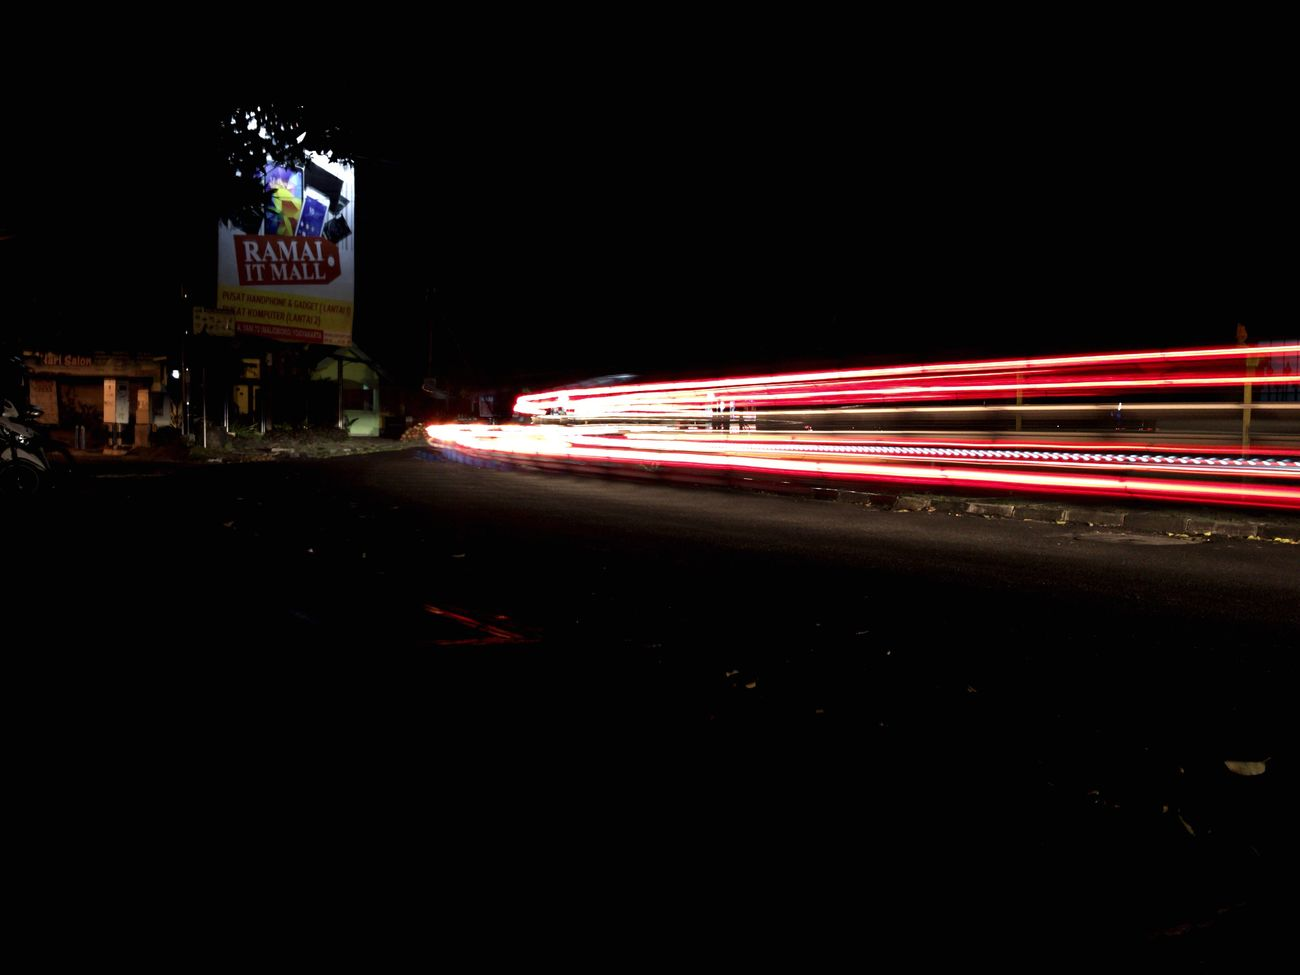 Night photograph. Illuminated Long Exposure Night Light Trail Neon Outdoors Speed Slowshutterphotography Slowshutter Kind Of Night Slowshutters IPhoneography